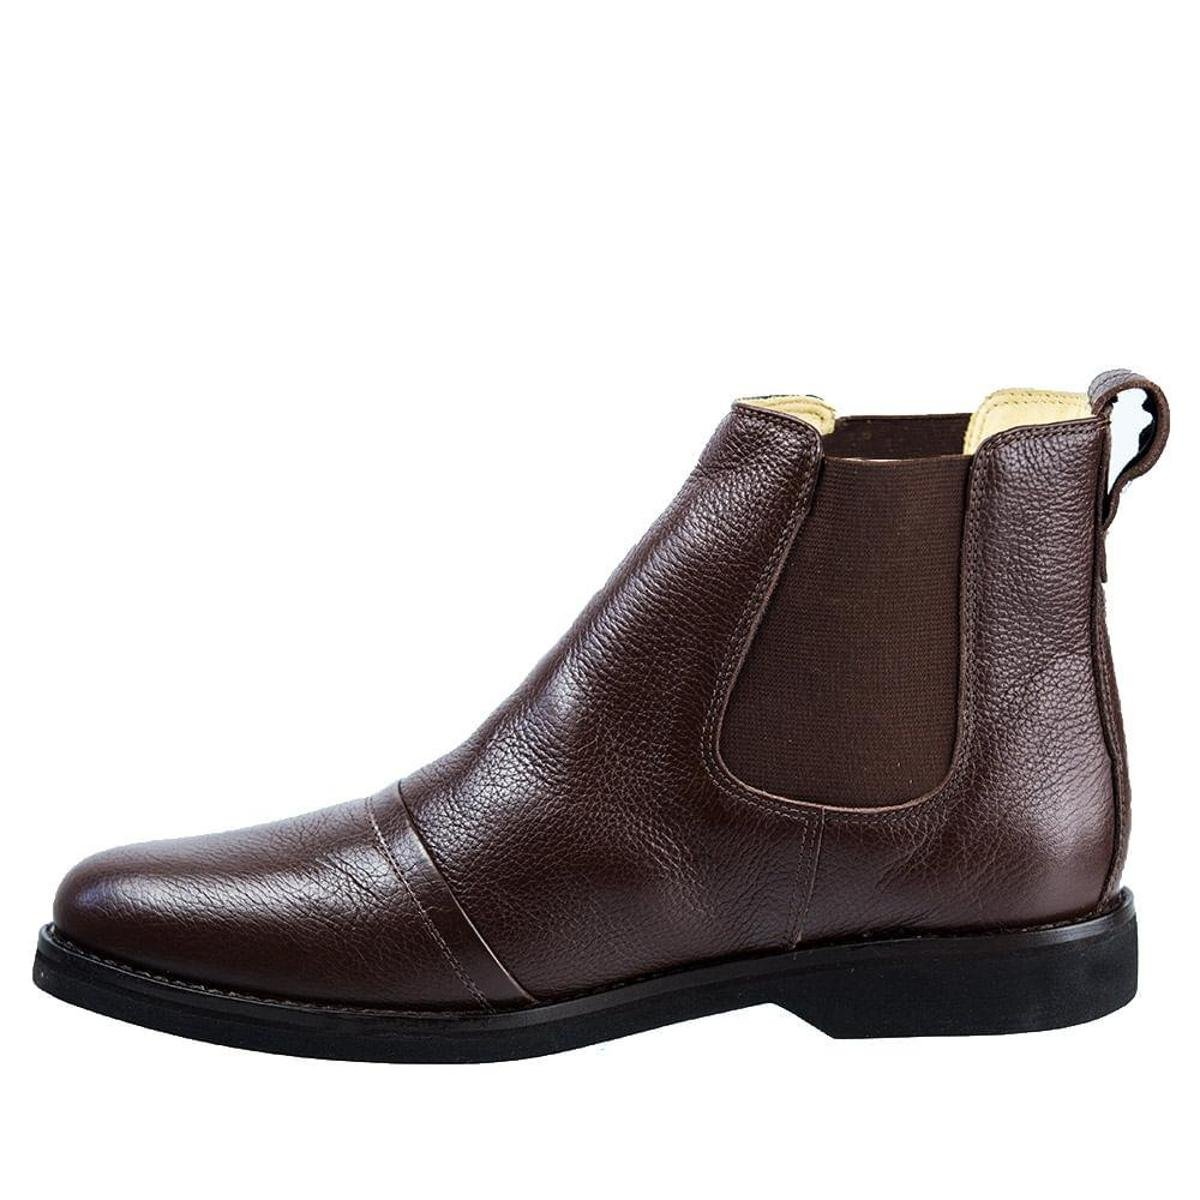 Bota Couro Floater 8611 Doctor Shoes Masculina - Café